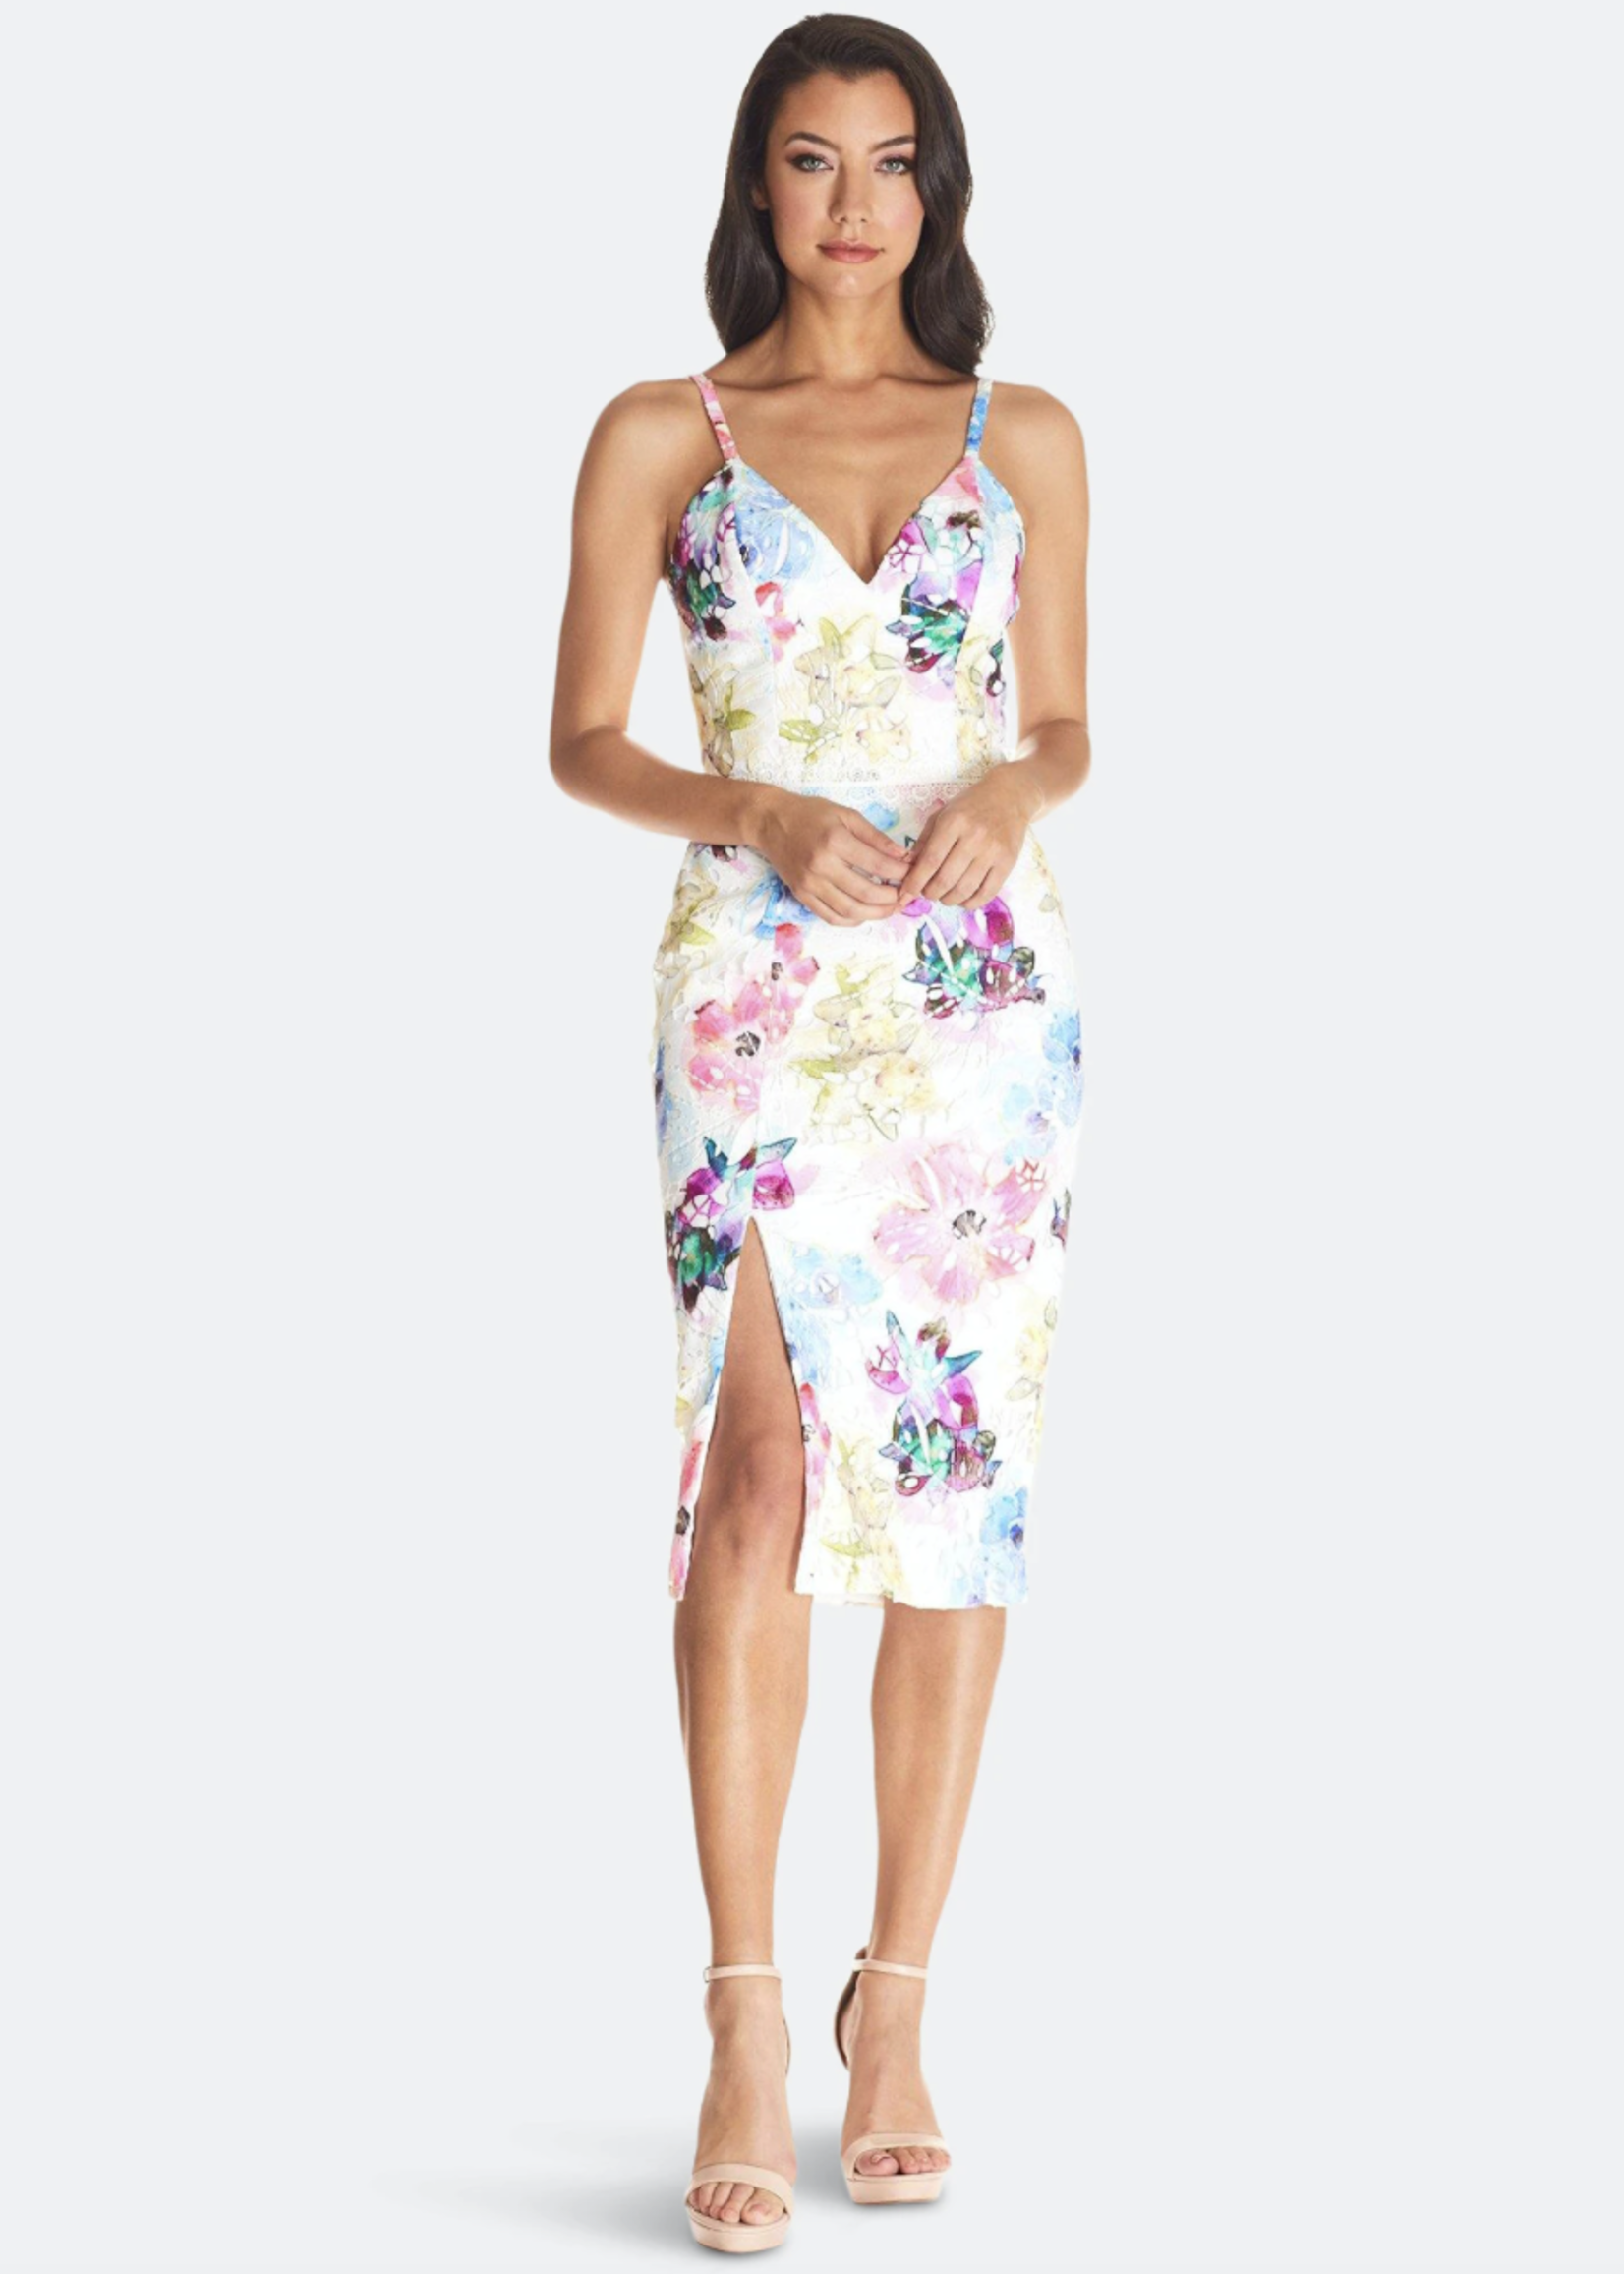 Elitaire Boutique The Joelle Dress in Raspberry Multi